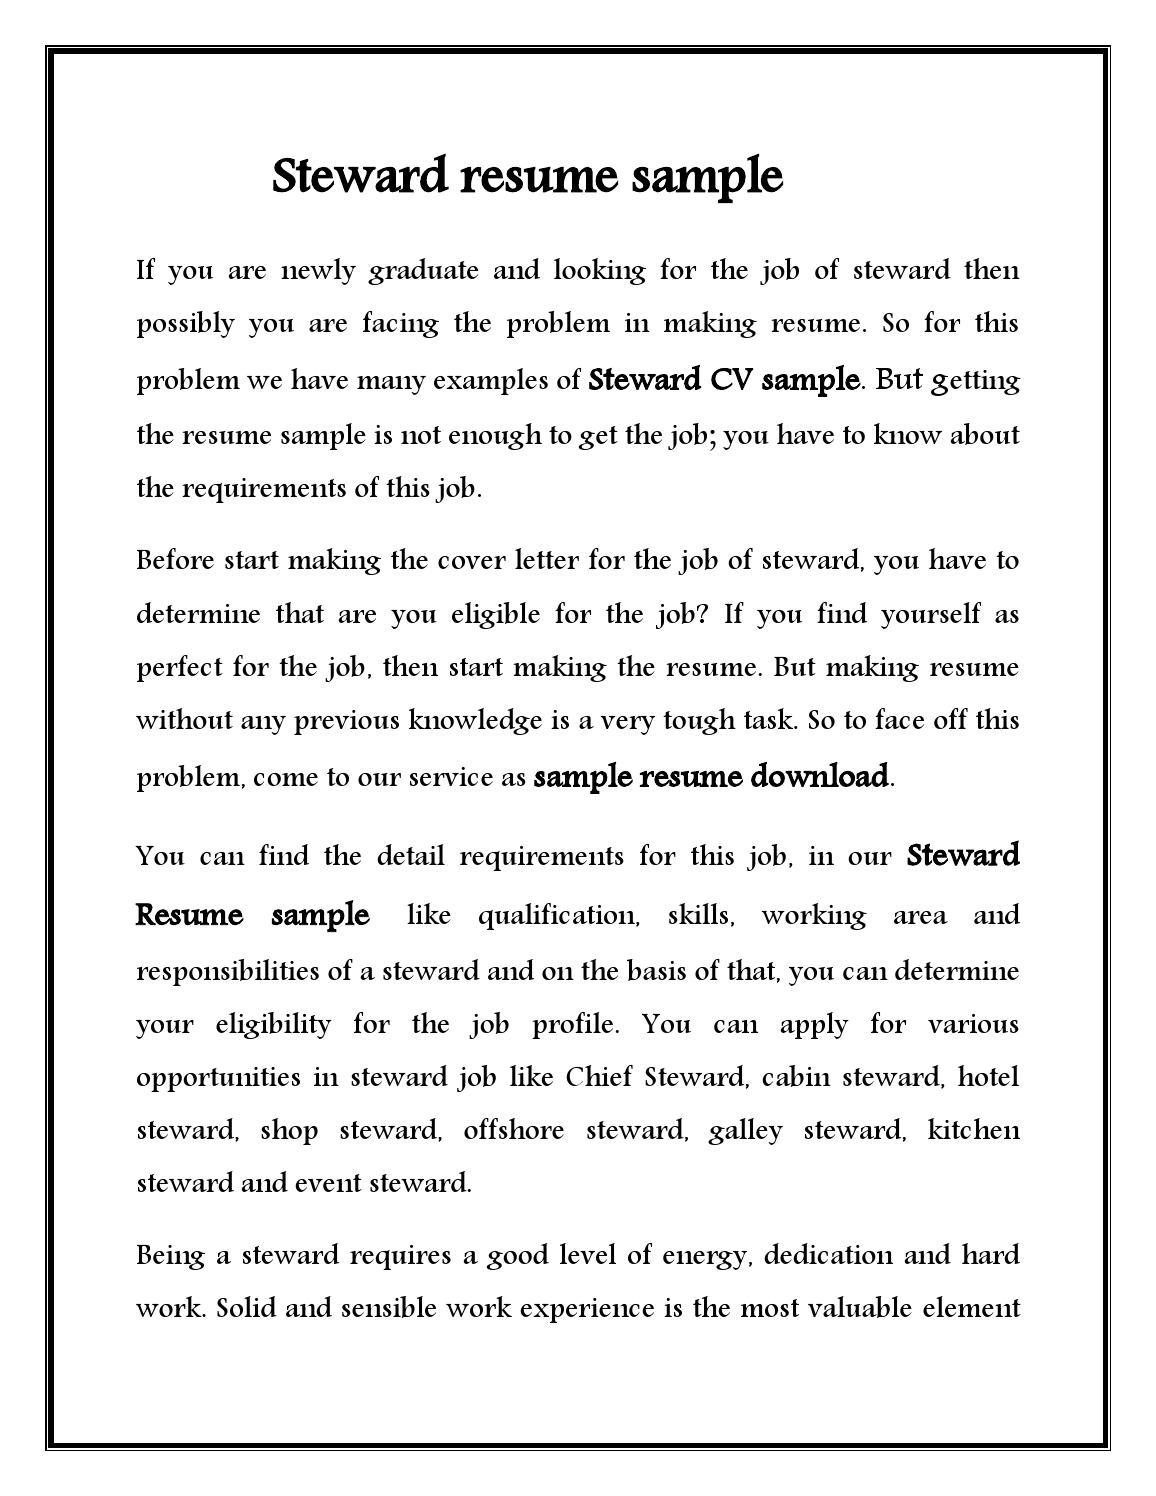 Cv For Hotel Steward   Free Resume Templates & Professional ...